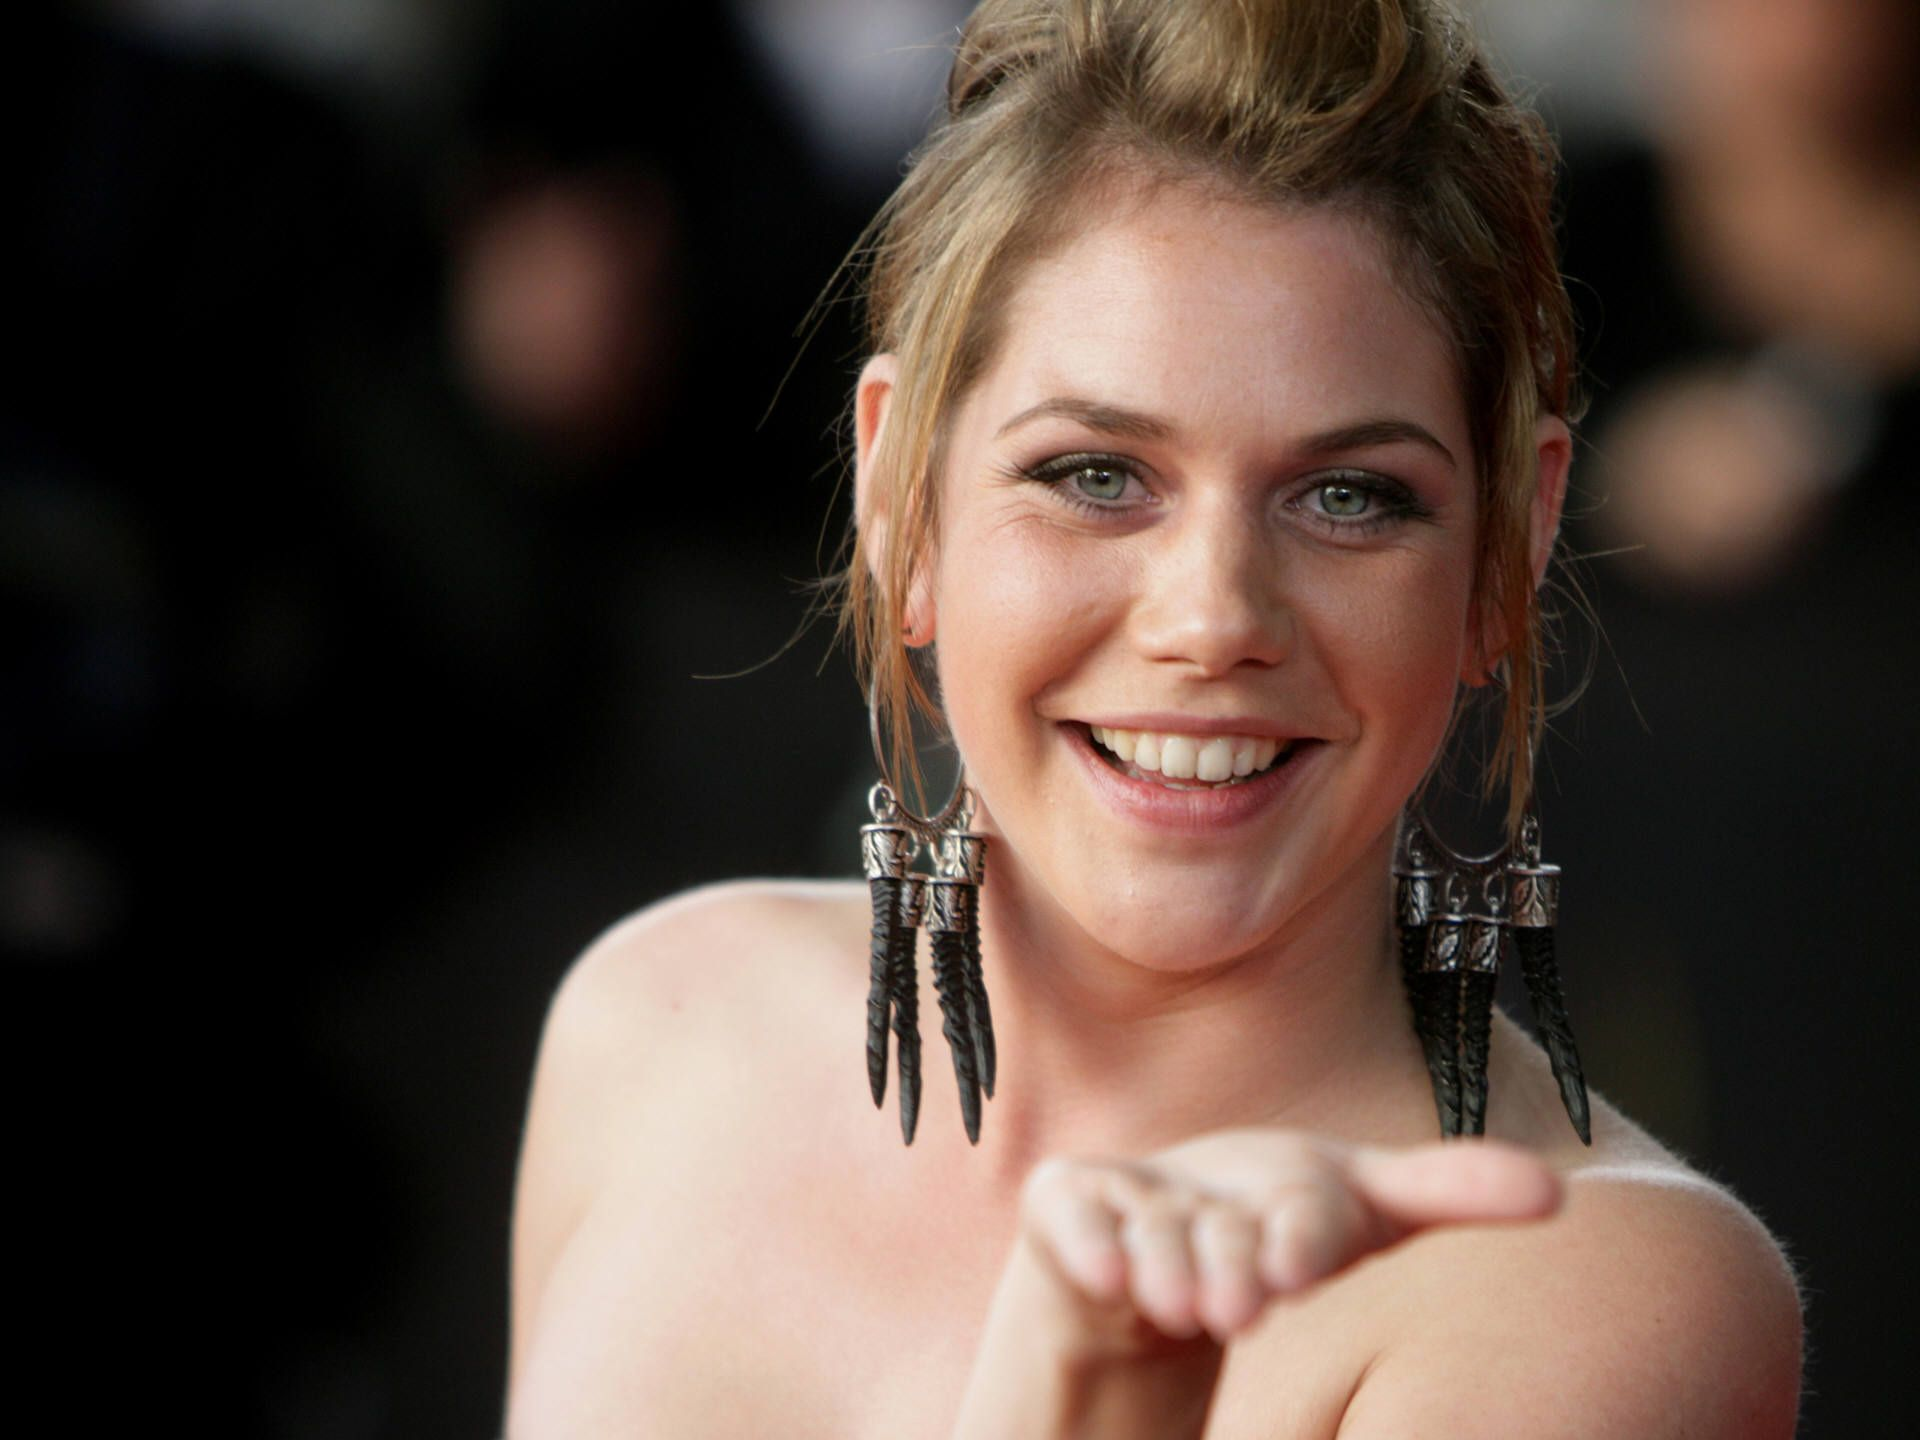 Best Eye Candy (Besteyecandy.com) - Celebrity Photo ...